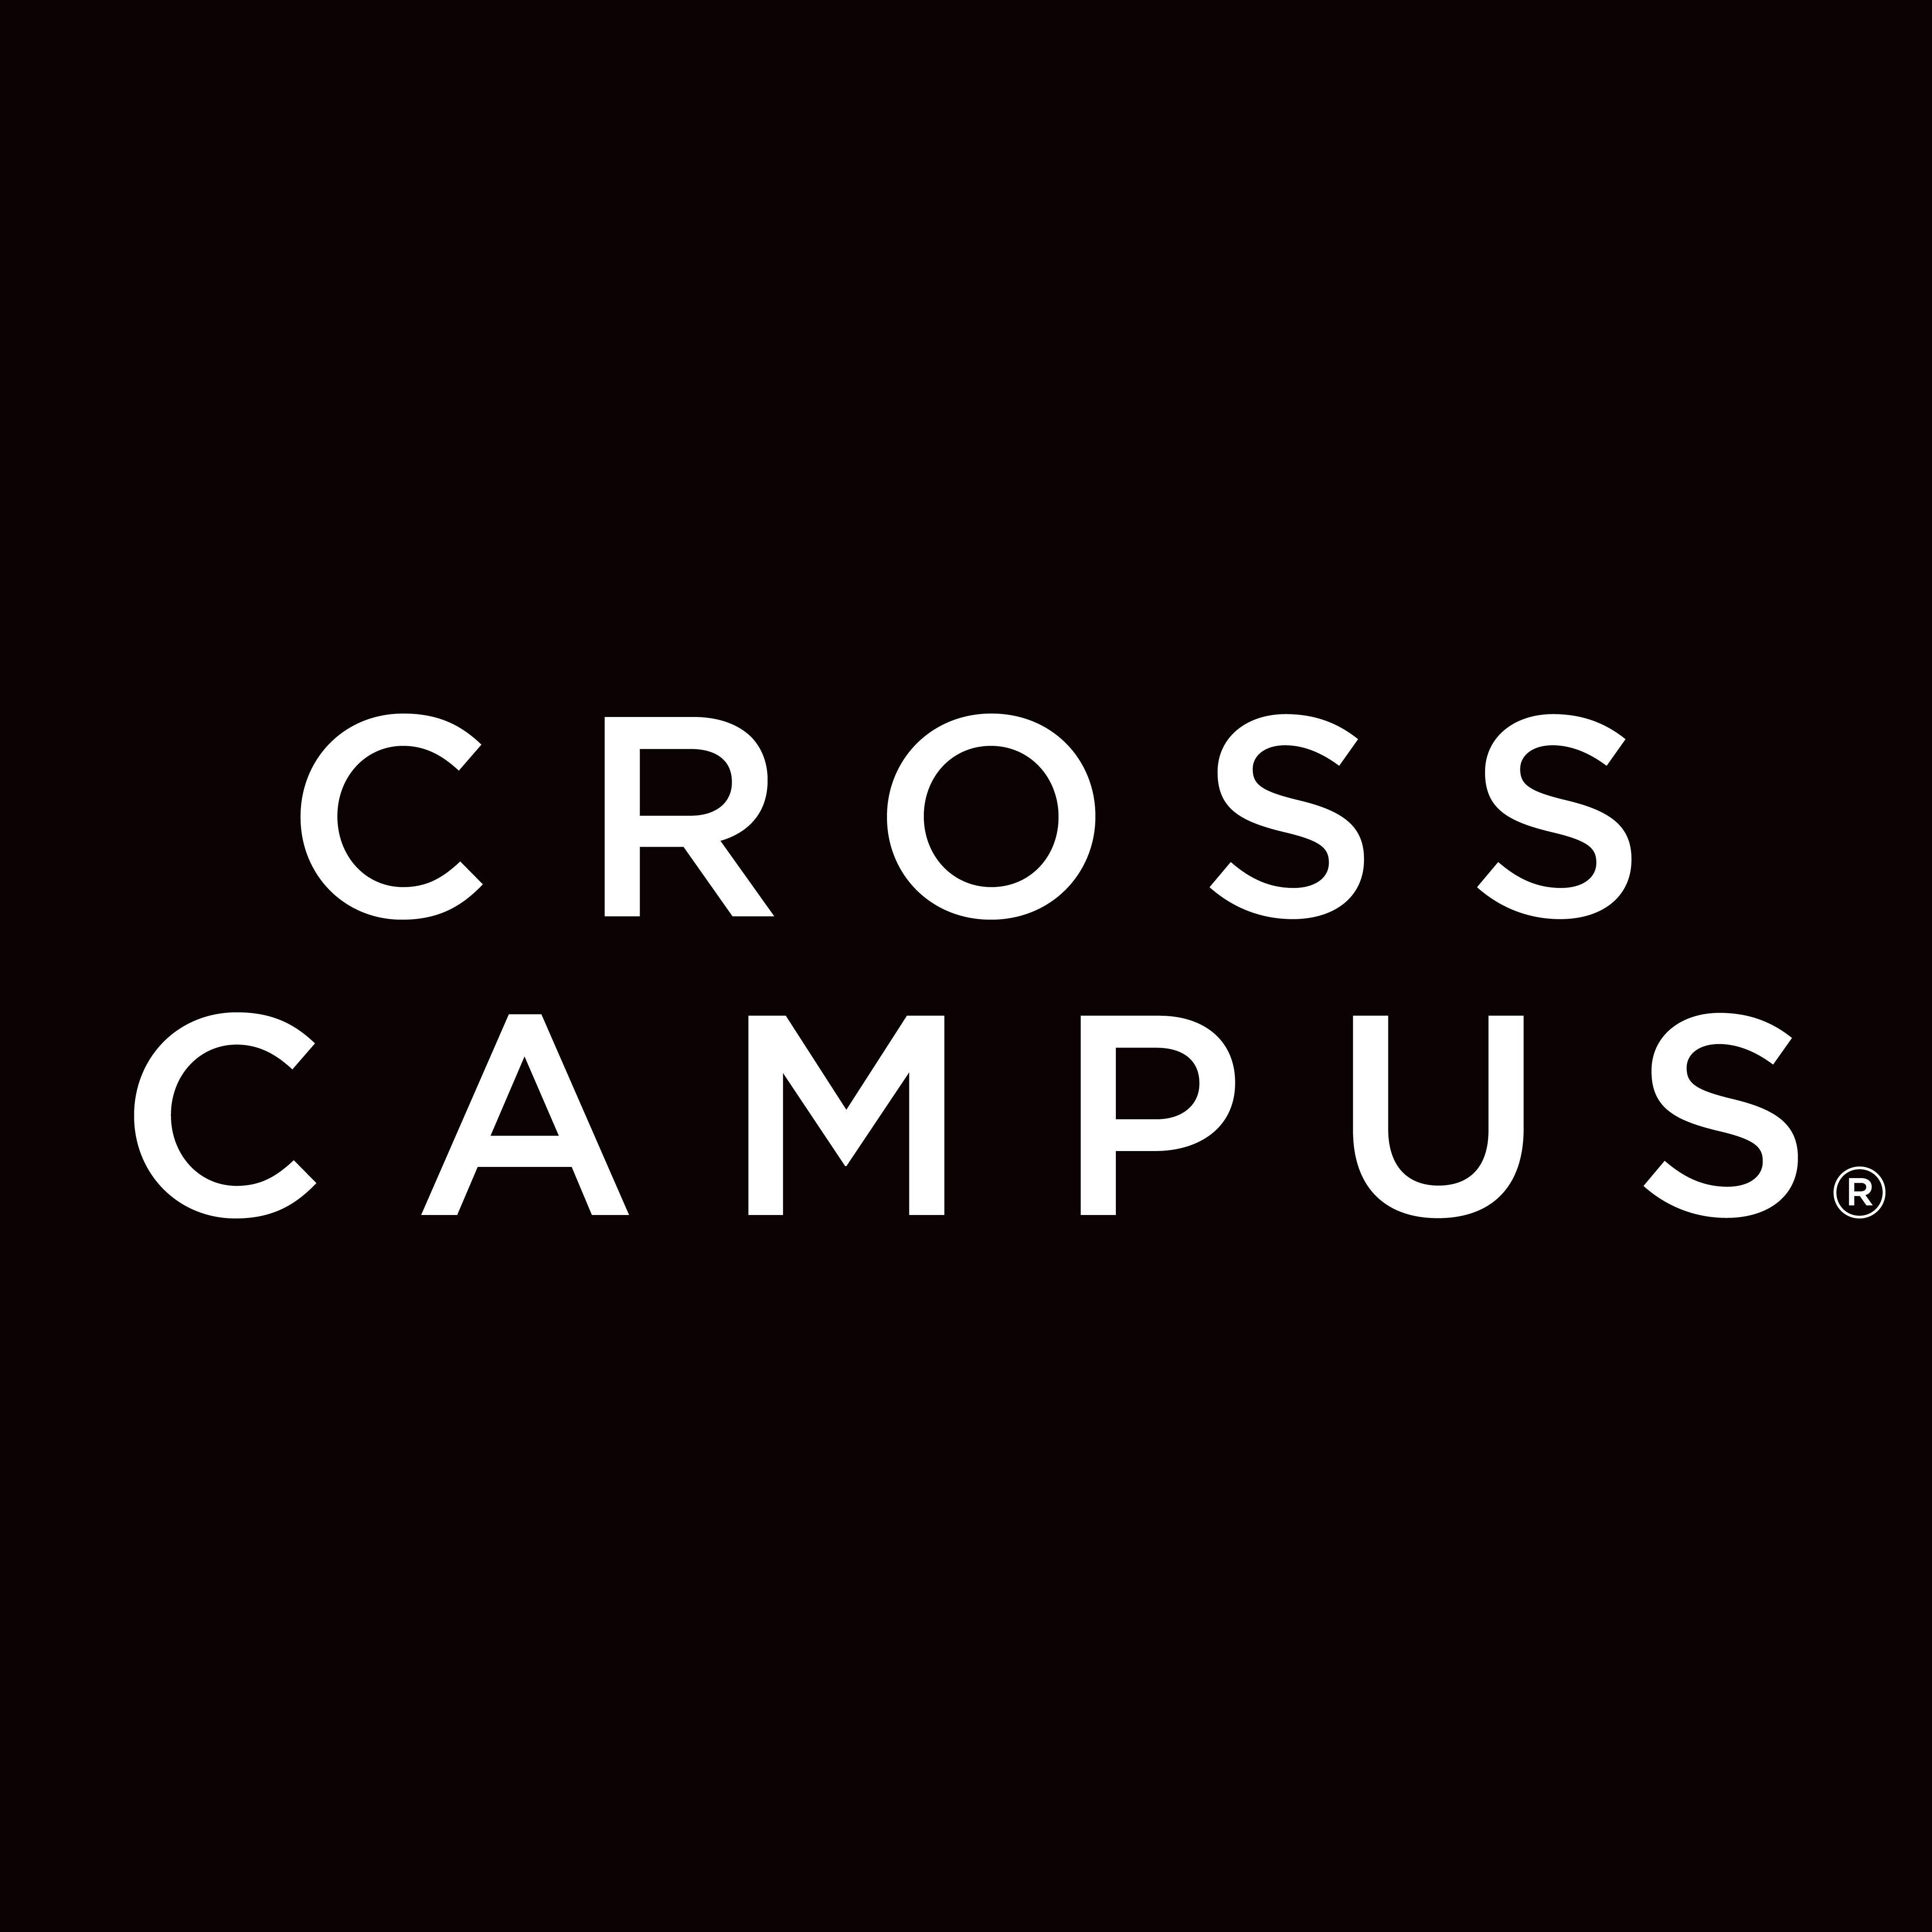 Logo of Cross Campus San Diego